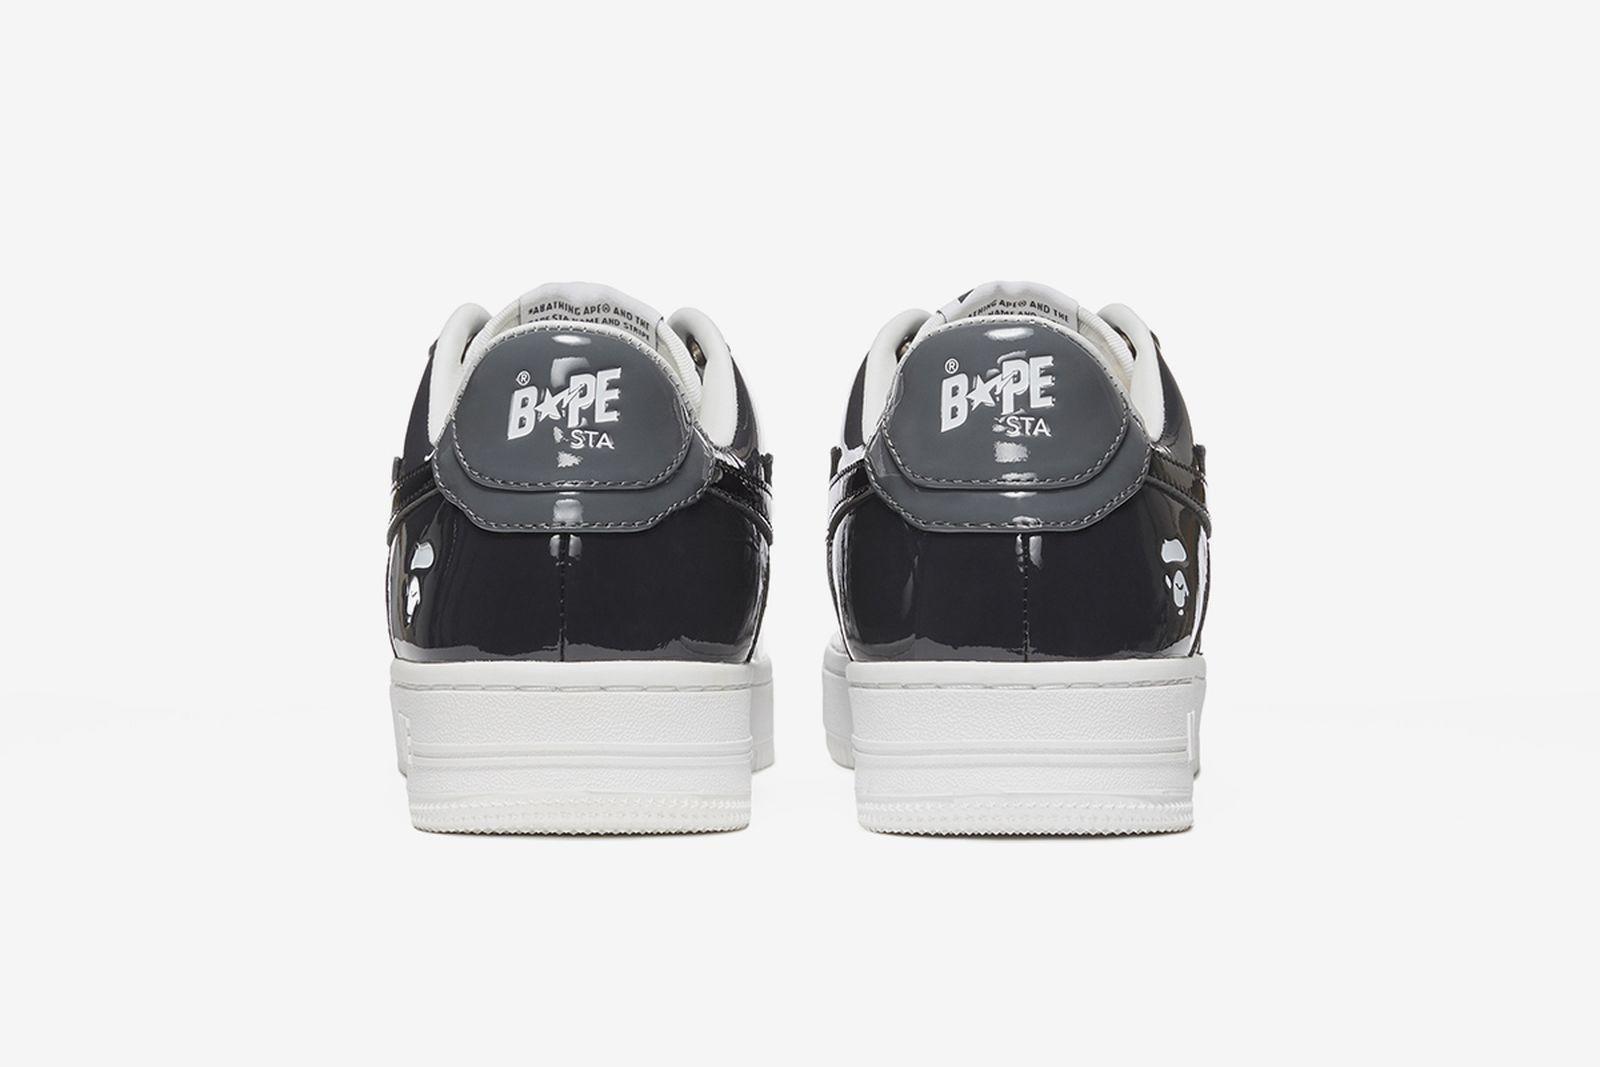 bape-sta-color-camo-combo-release-date-price-02